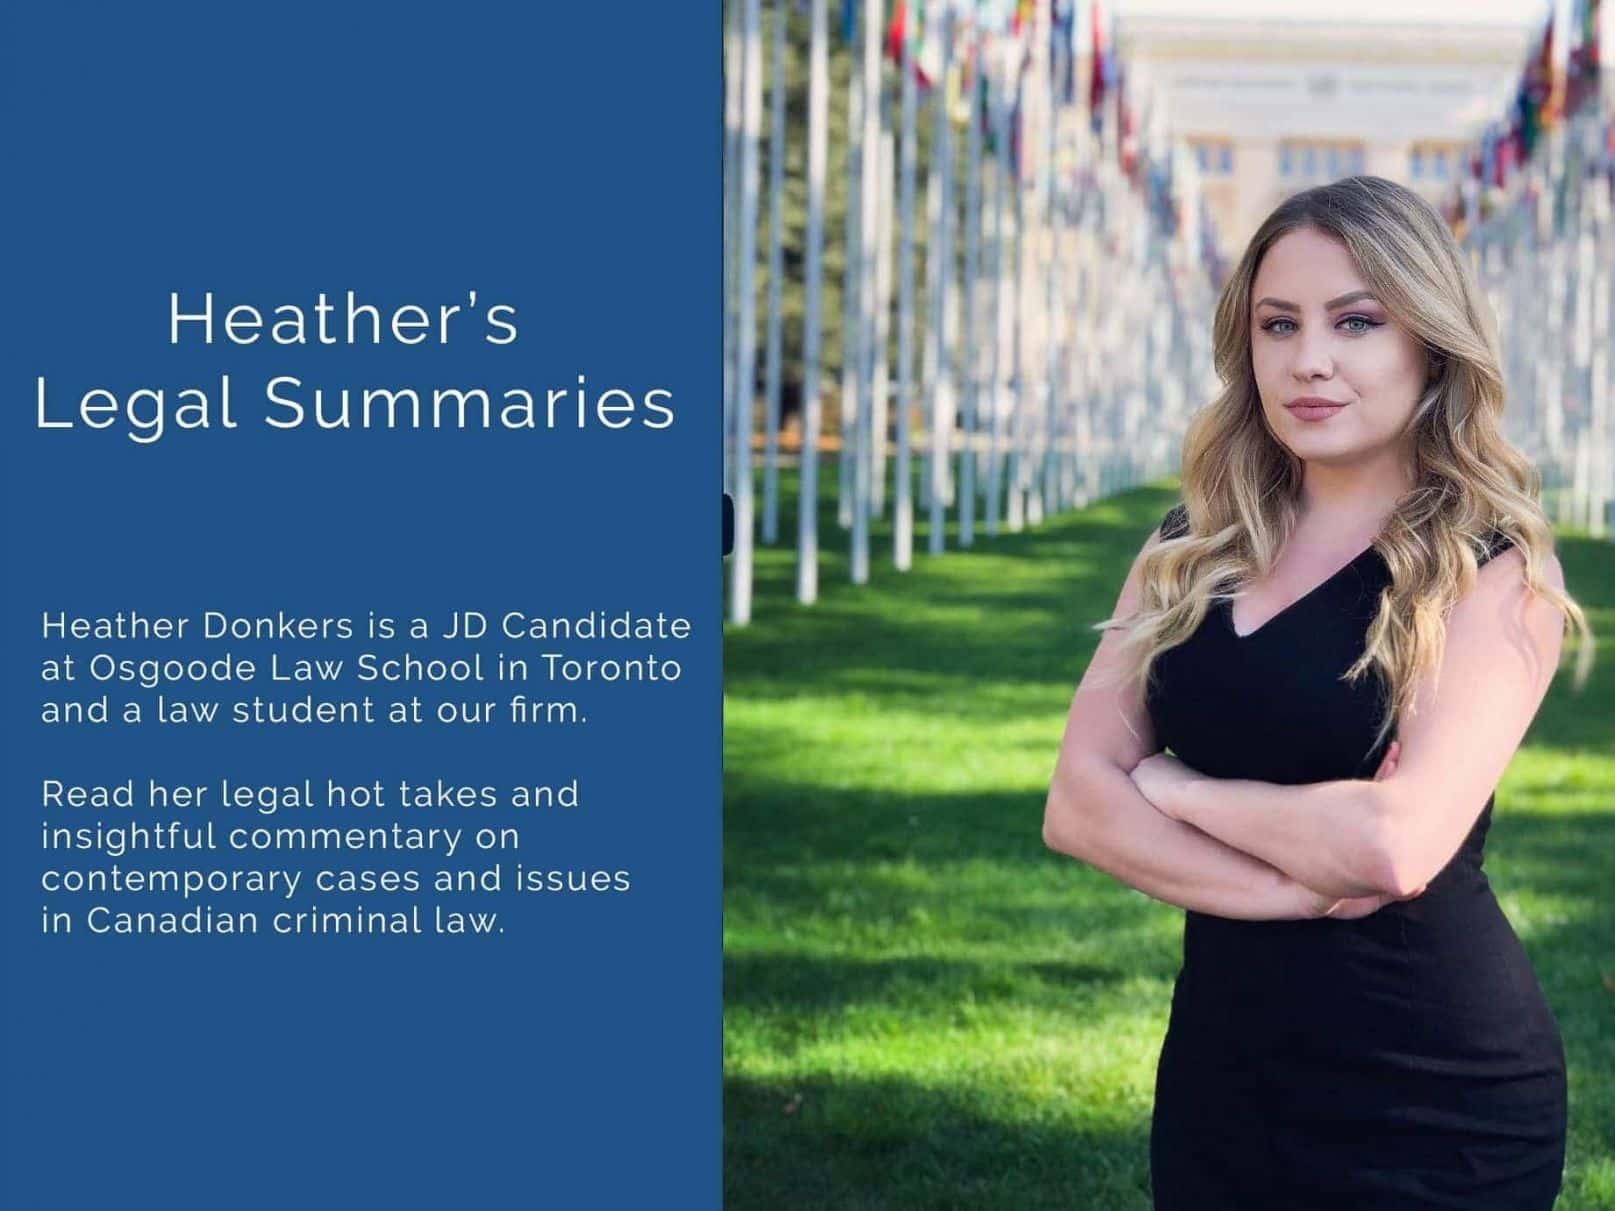 Heather's legal summaries cumulative hearsay rule